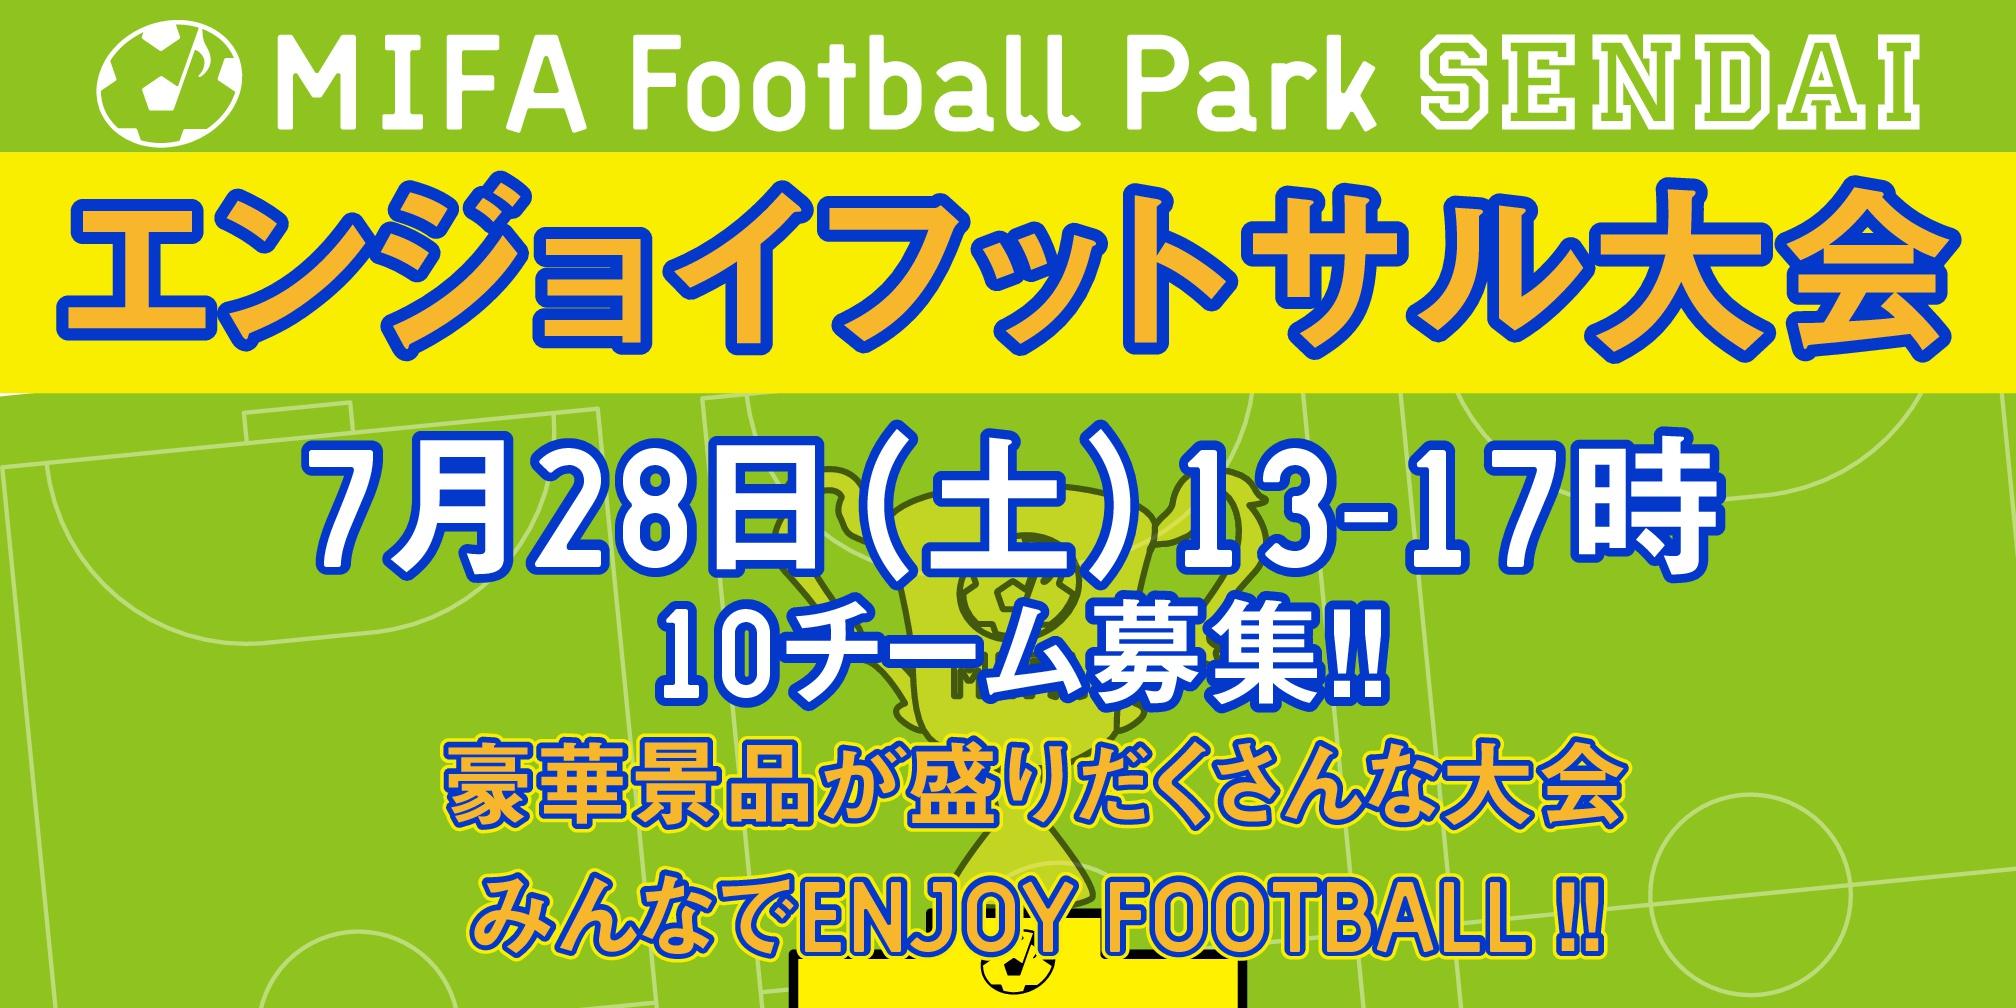 MIFA Football Park主催フットサル大会